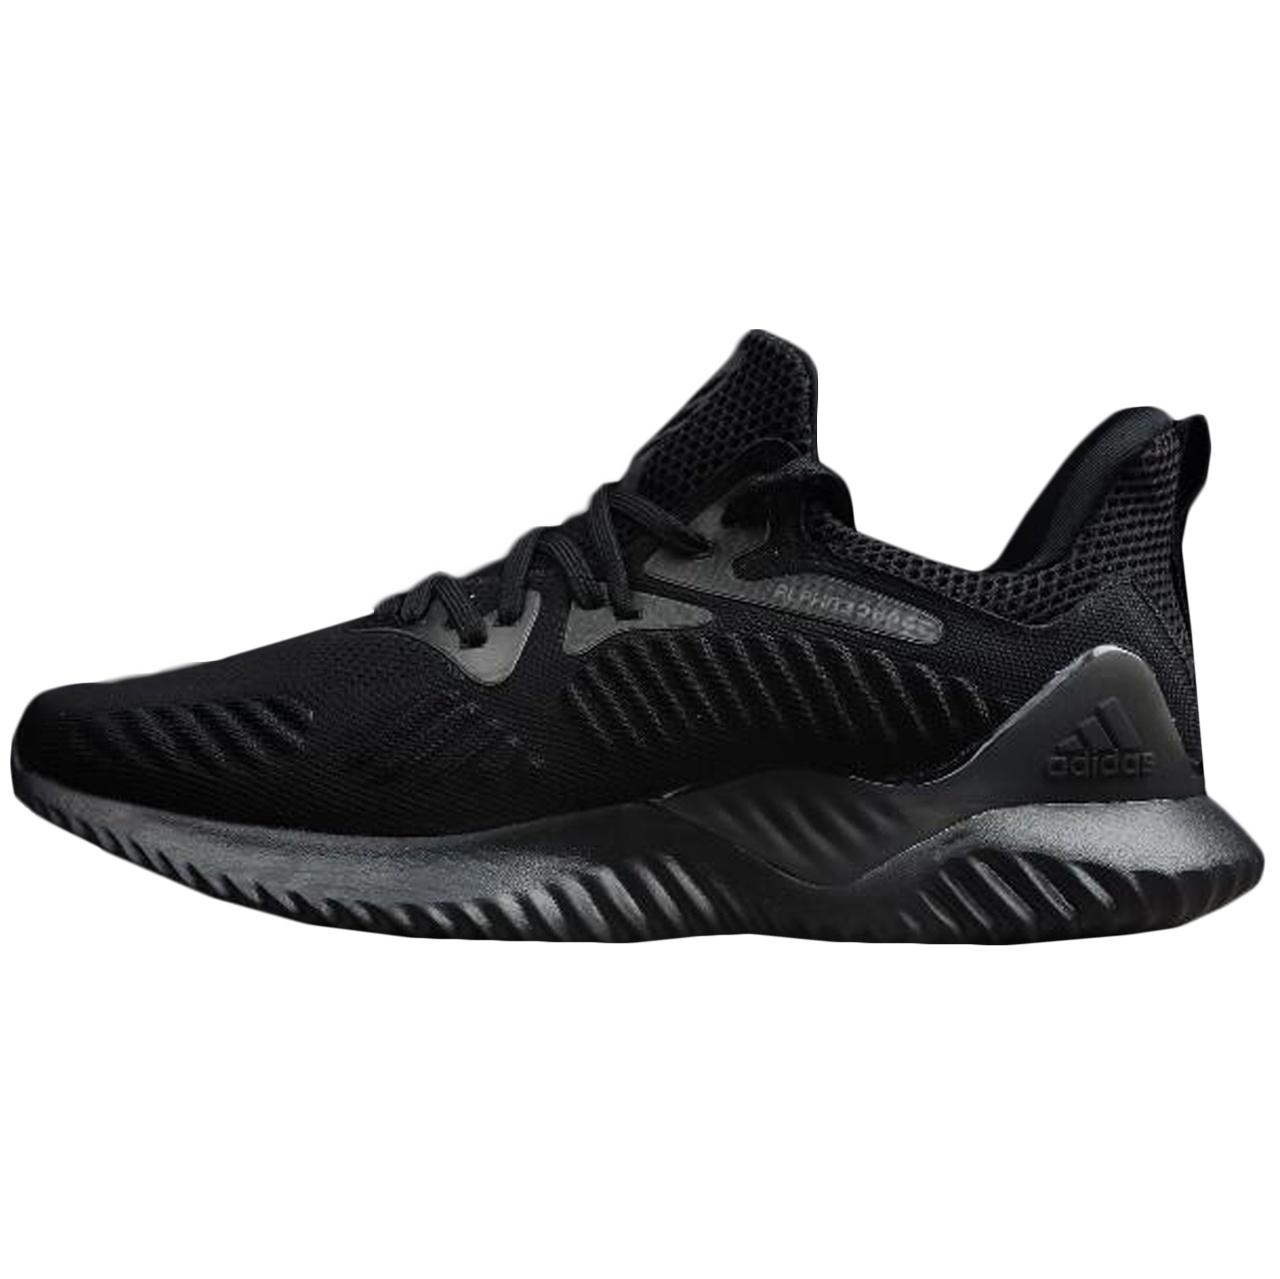 تصویر کفش مخصوص دویدن مردانه آدیداس مدل  Alphabounce beyond M کد 987340